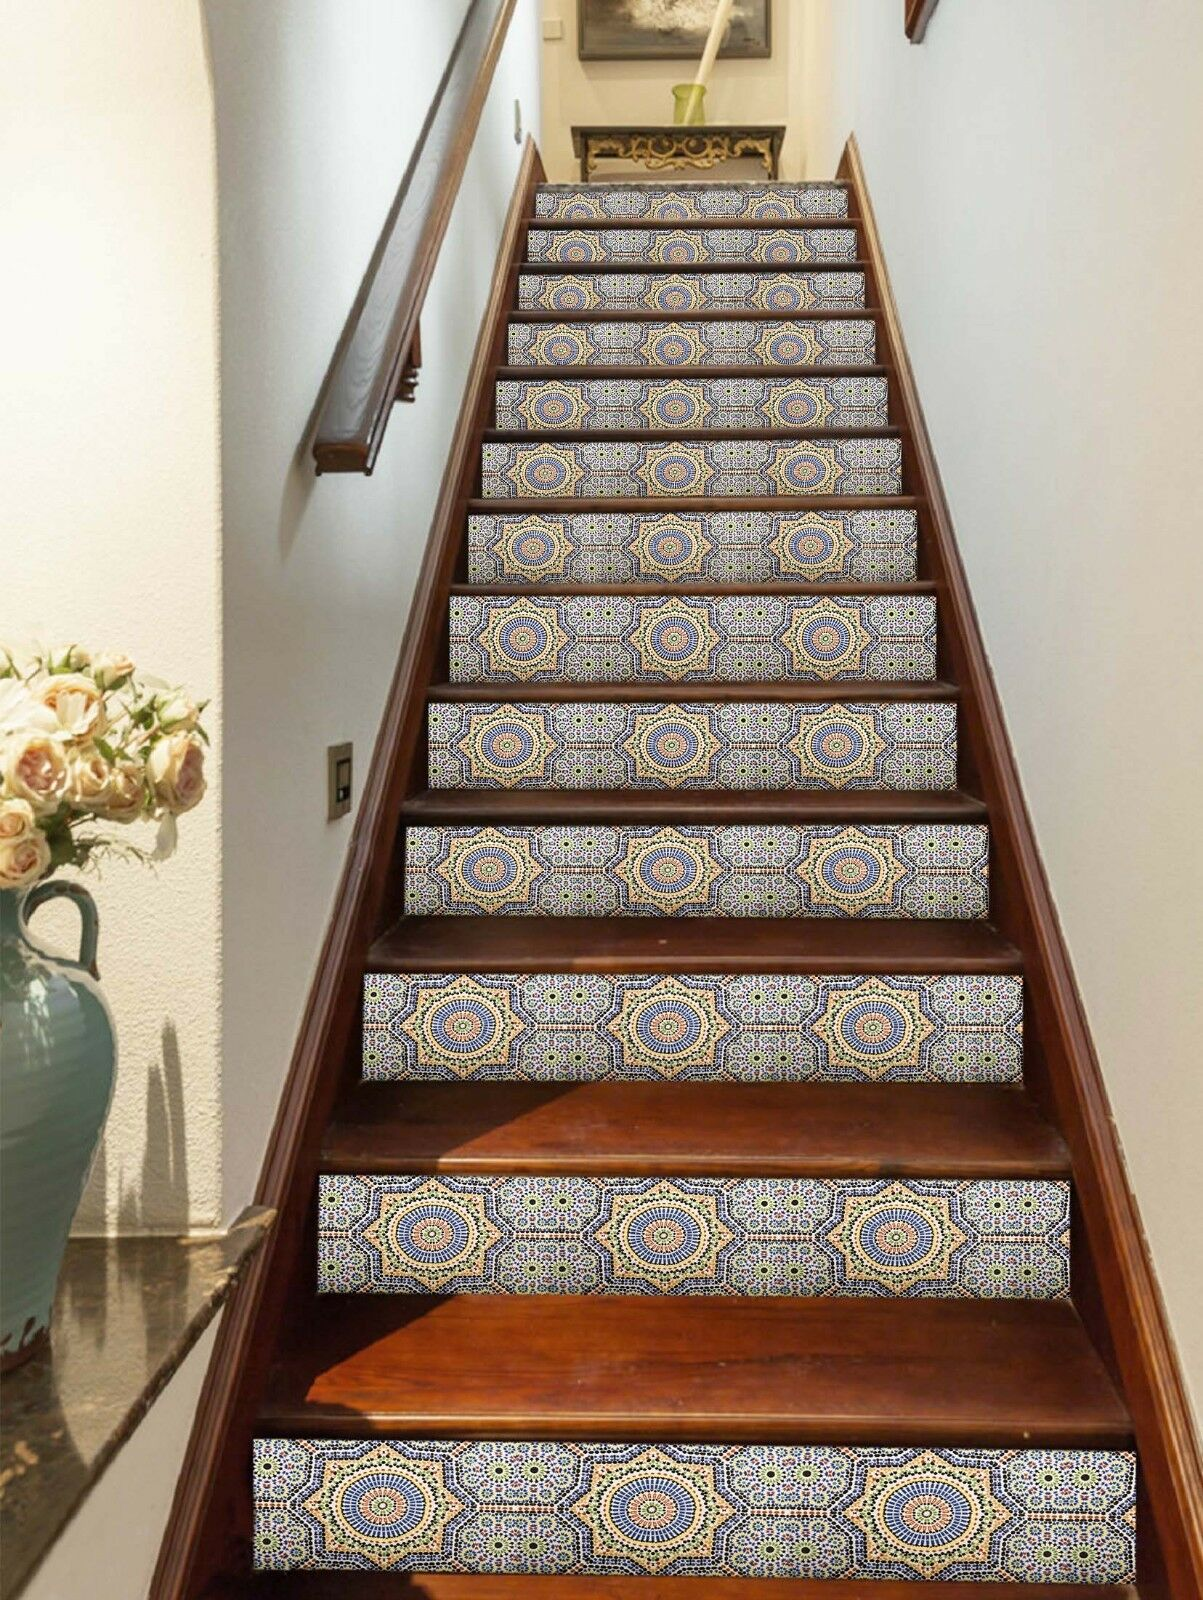 3D Pattern 571 Stair Riser Decoration Photo Mural Vinyl Decal WandPapier UK Lemon